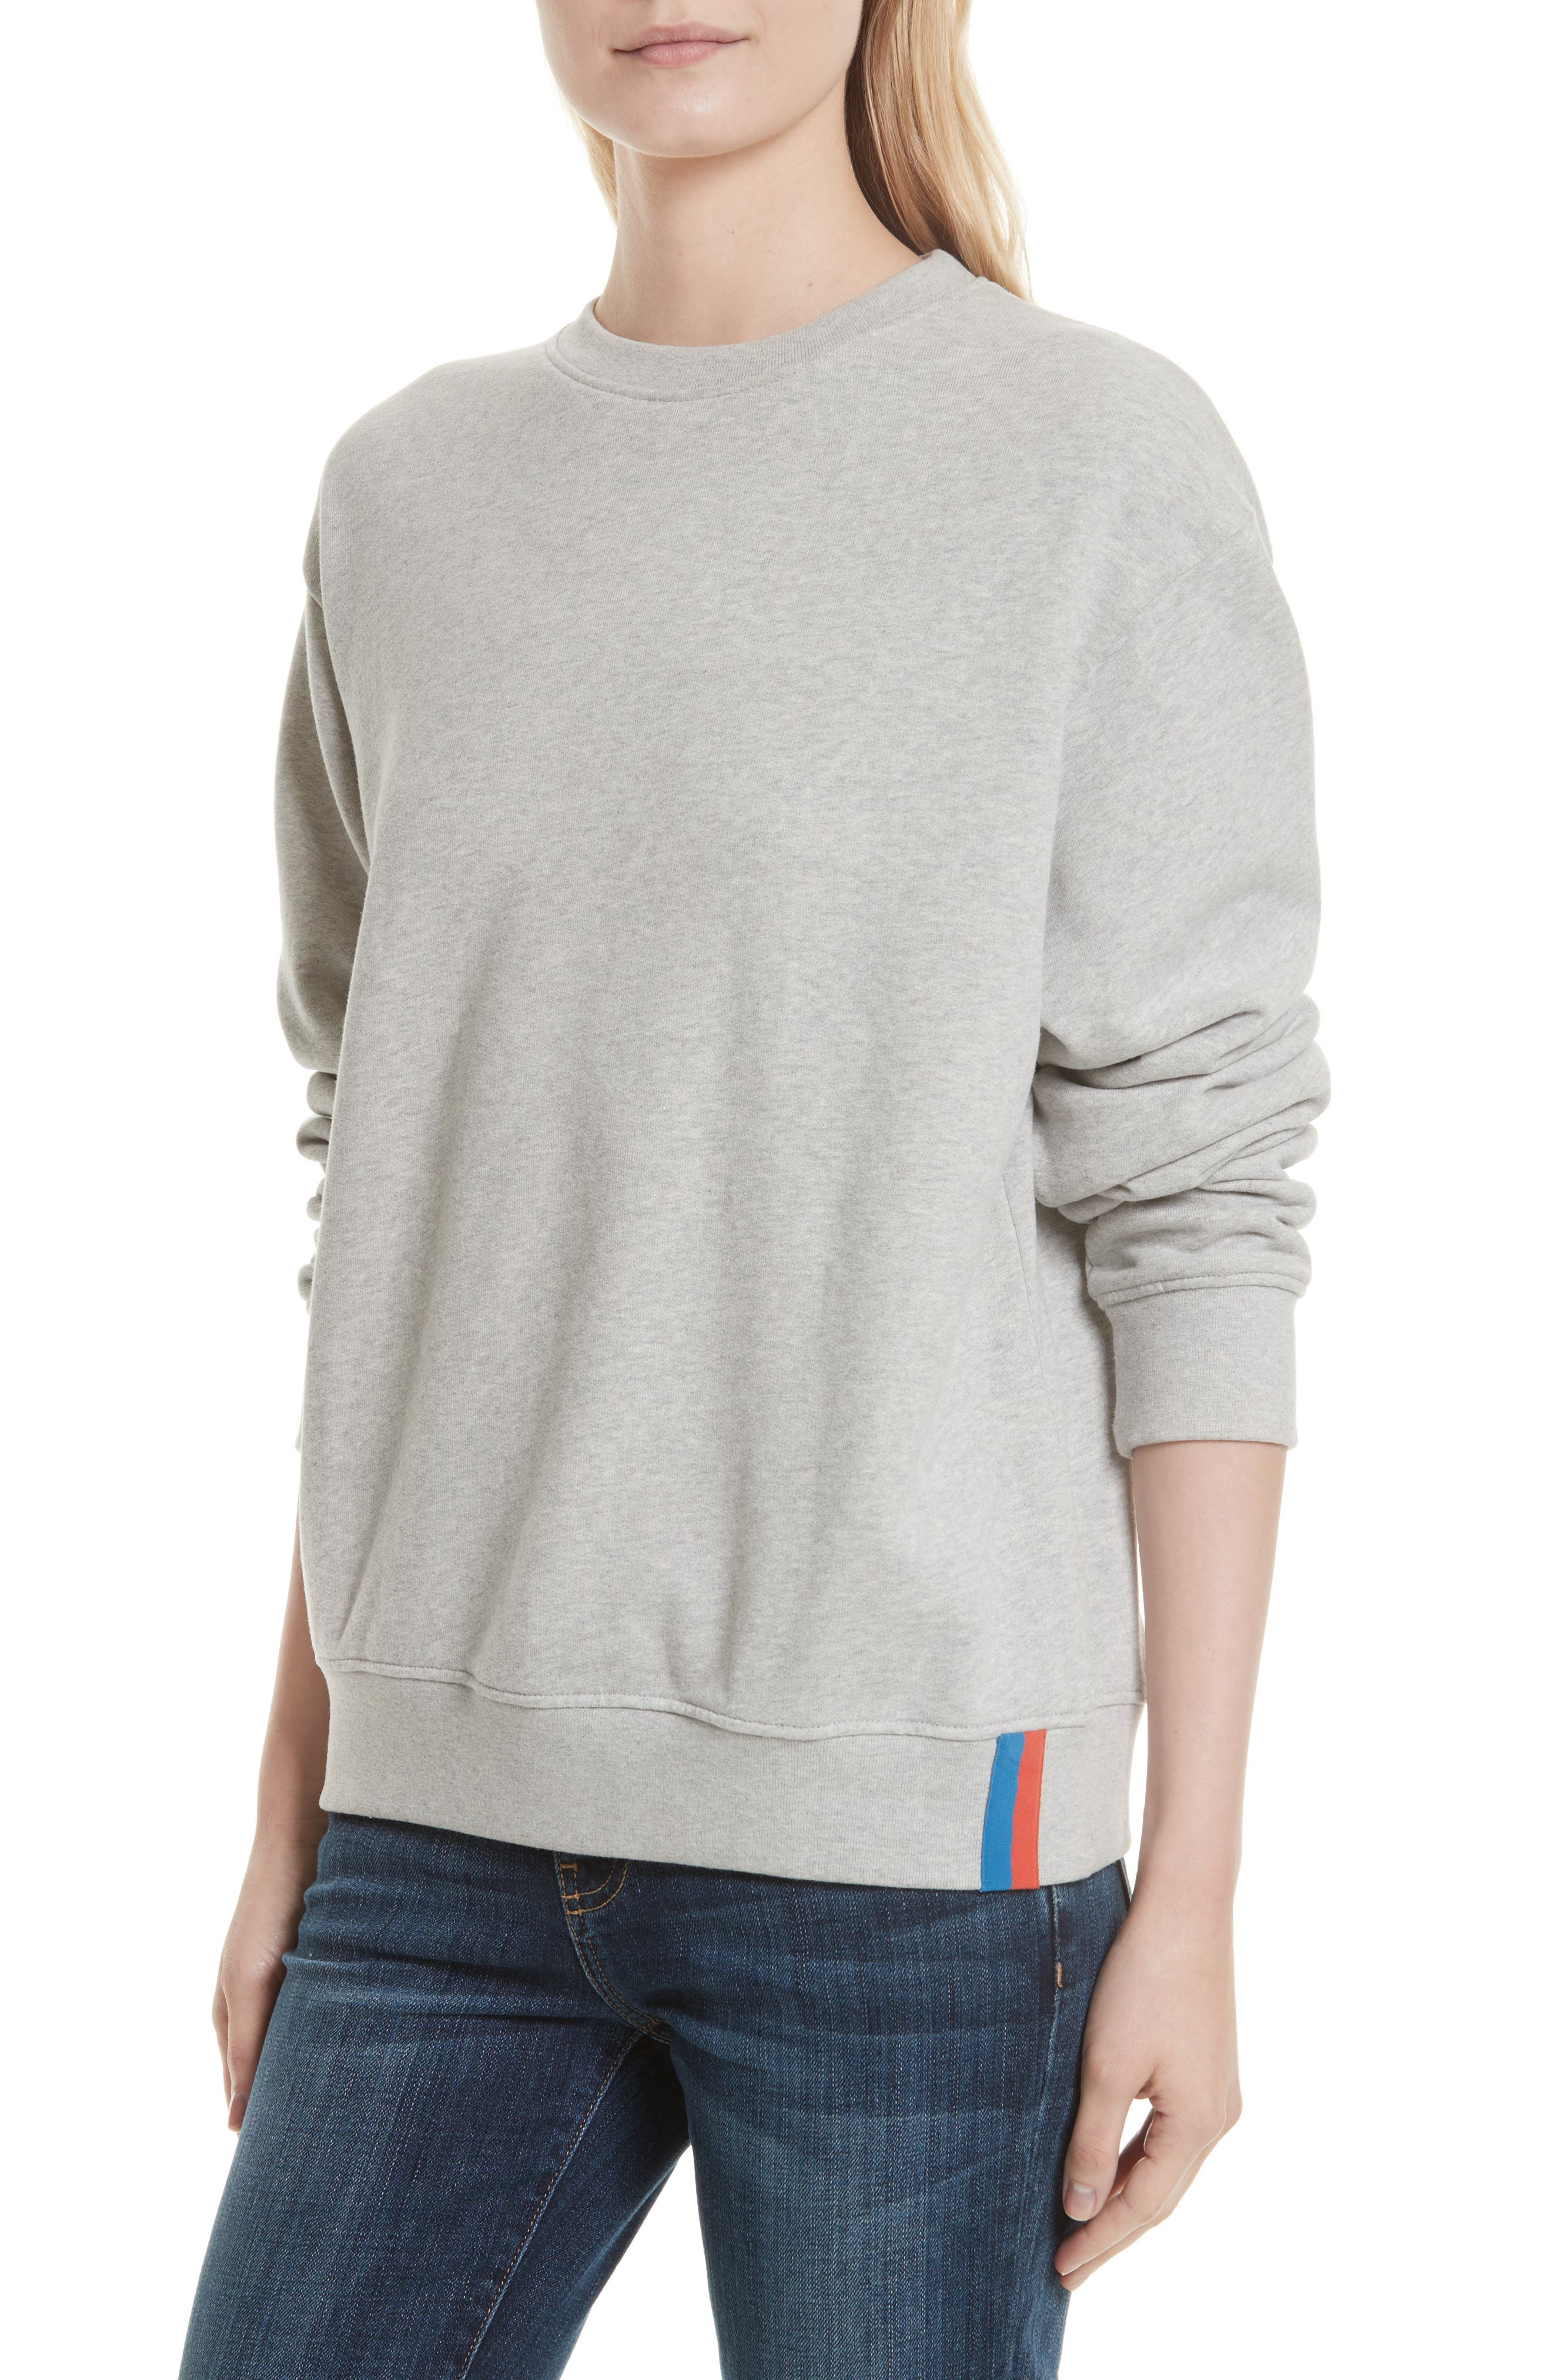 Cotton Sweatshirt,                             Main thumbnail 1, color,                             HEATHER GREY